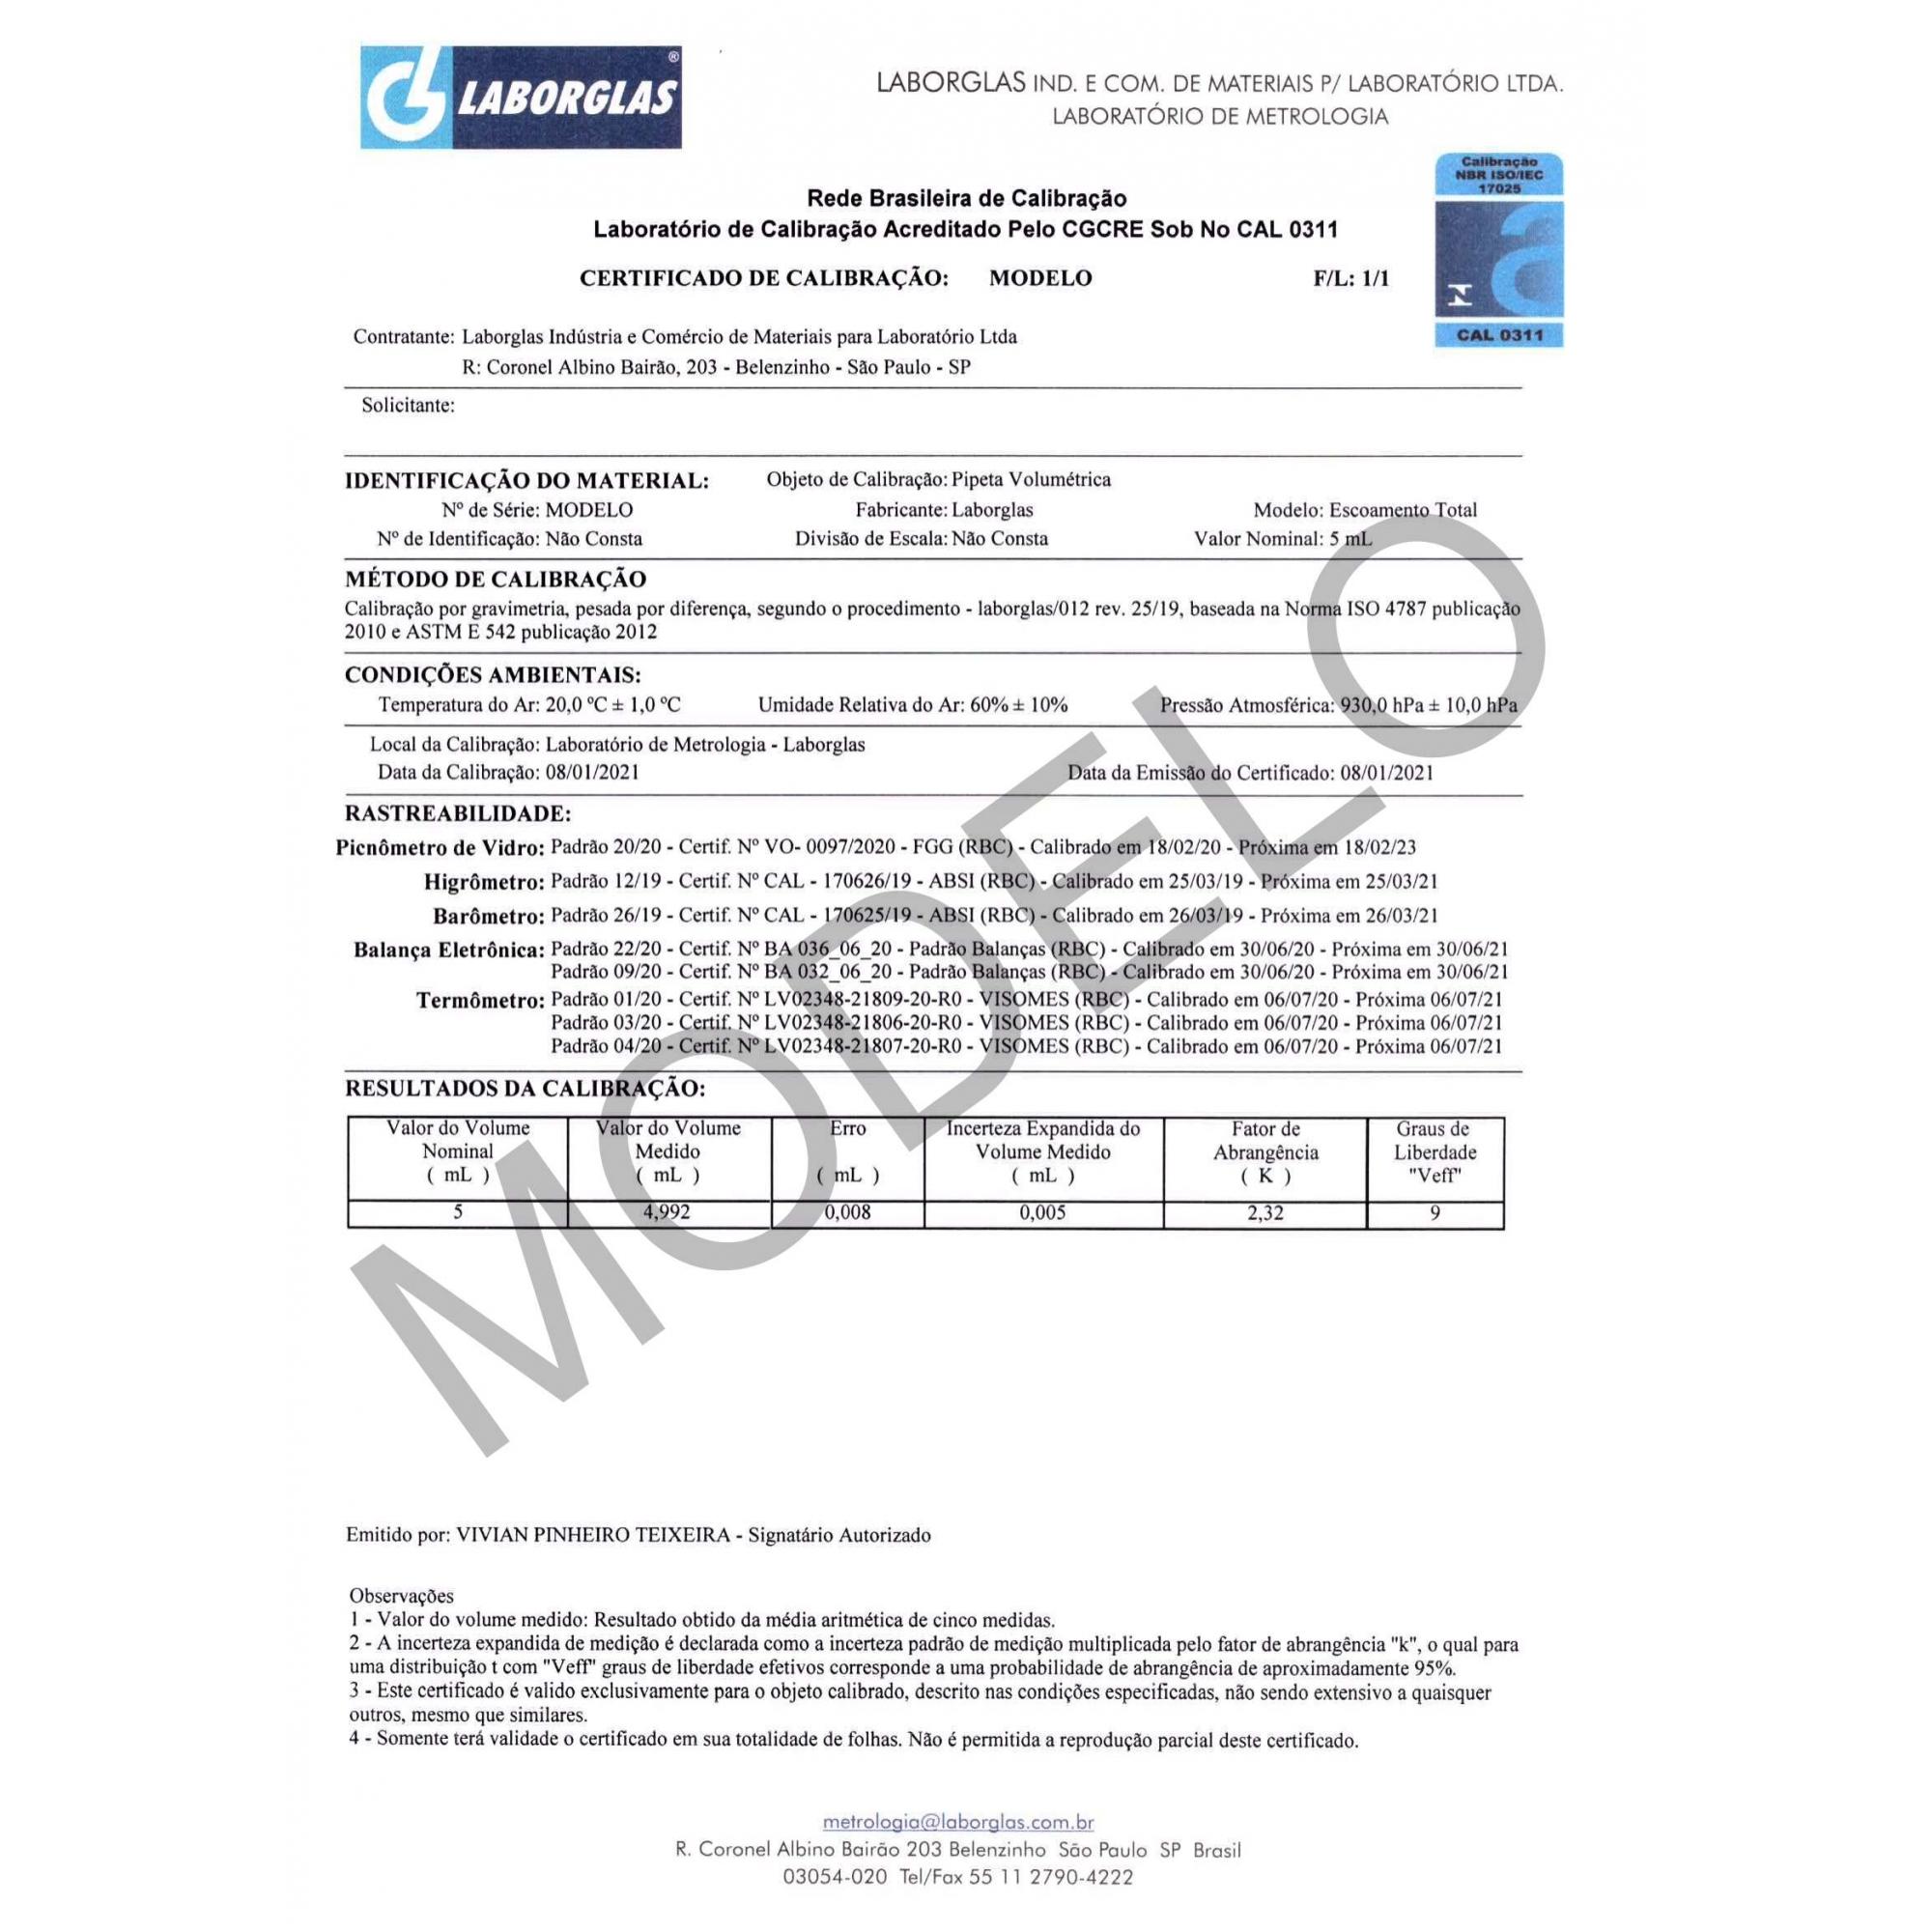 PIPETA VOLUMÉTRICA ESGOTAMENTO TOTAL 25 ML CERTIFICADO RBC - Laborglas - Cód. 9433715-R